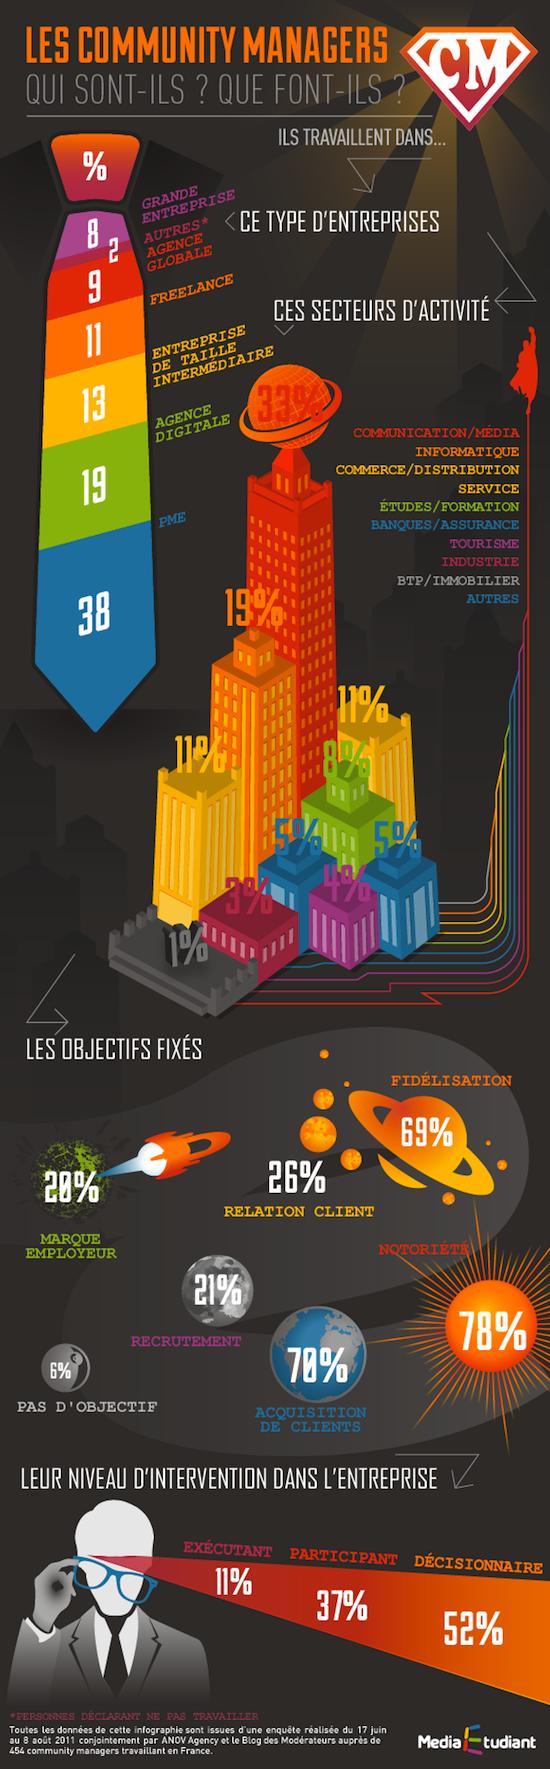 Semaine_du_Digital_infographies_communityManagment_v1-1